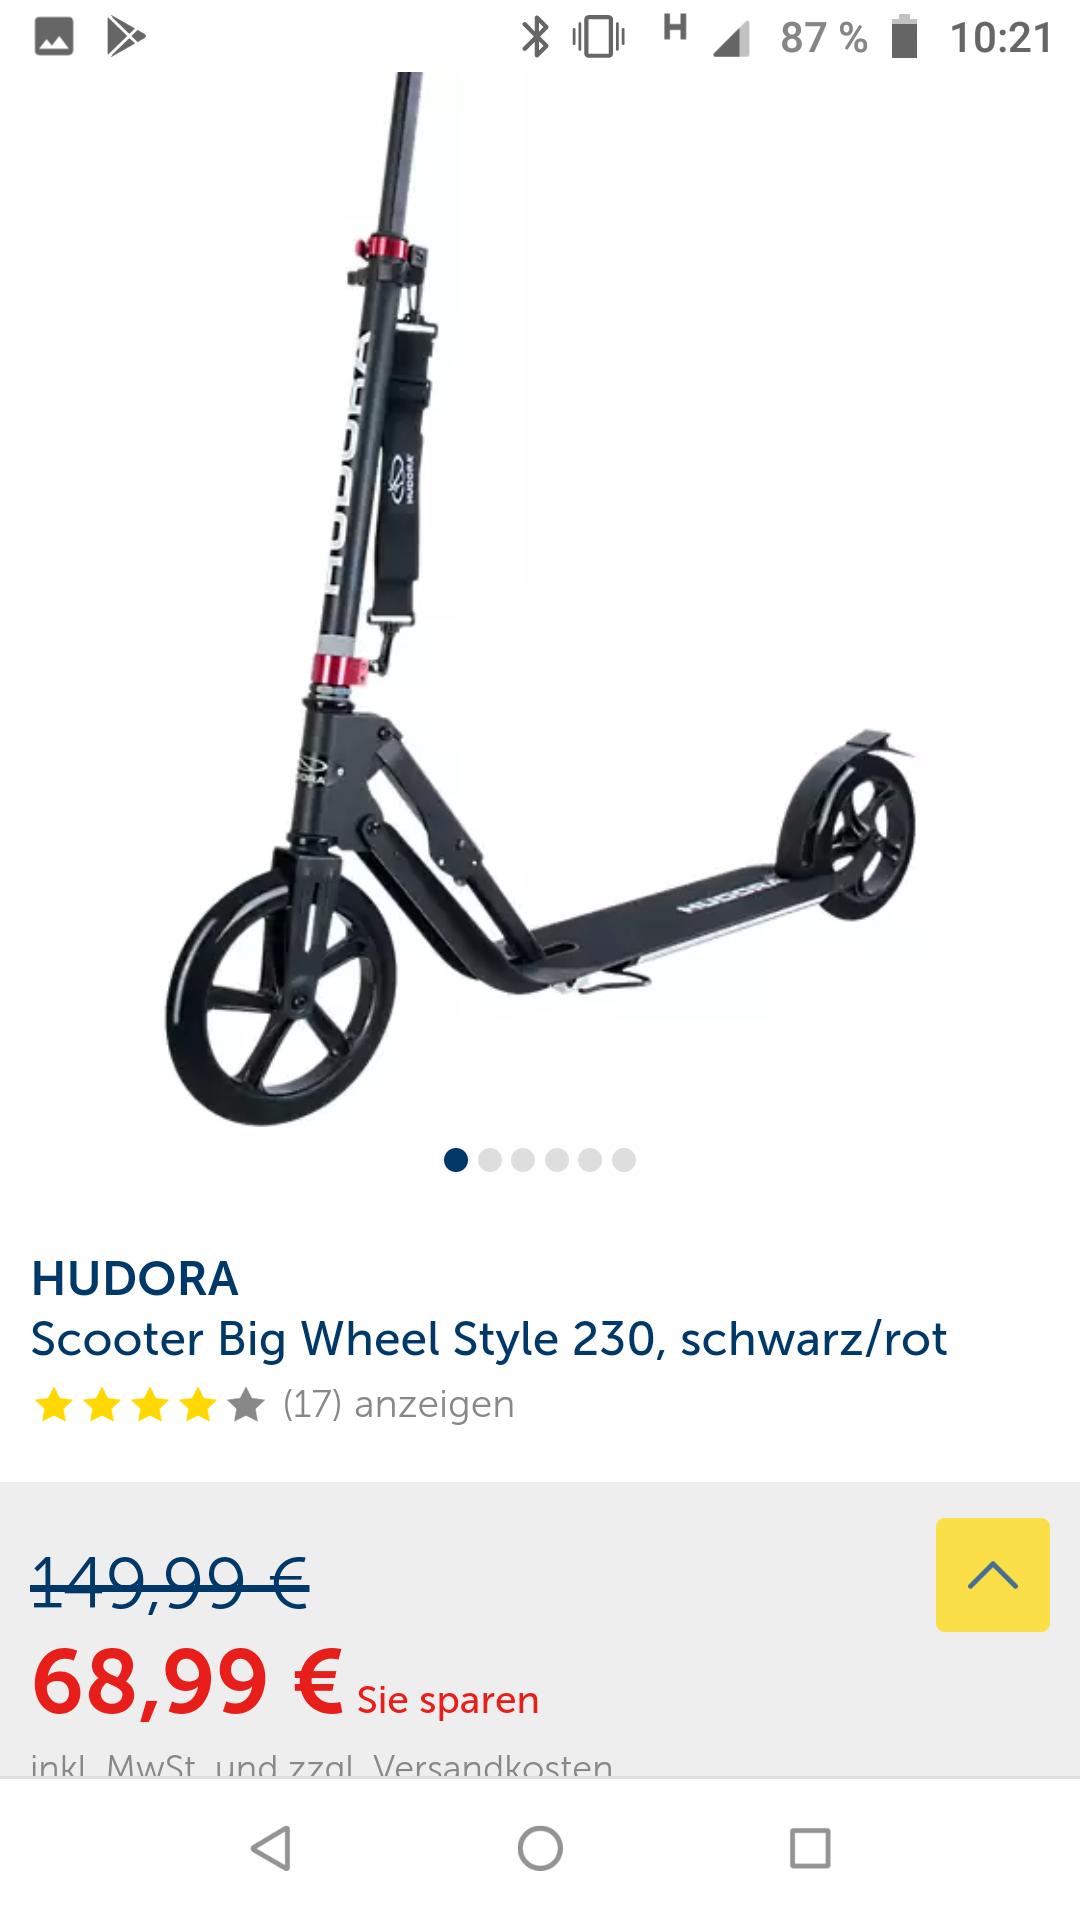 Hudora Tretroller Big Wheel 230 Style